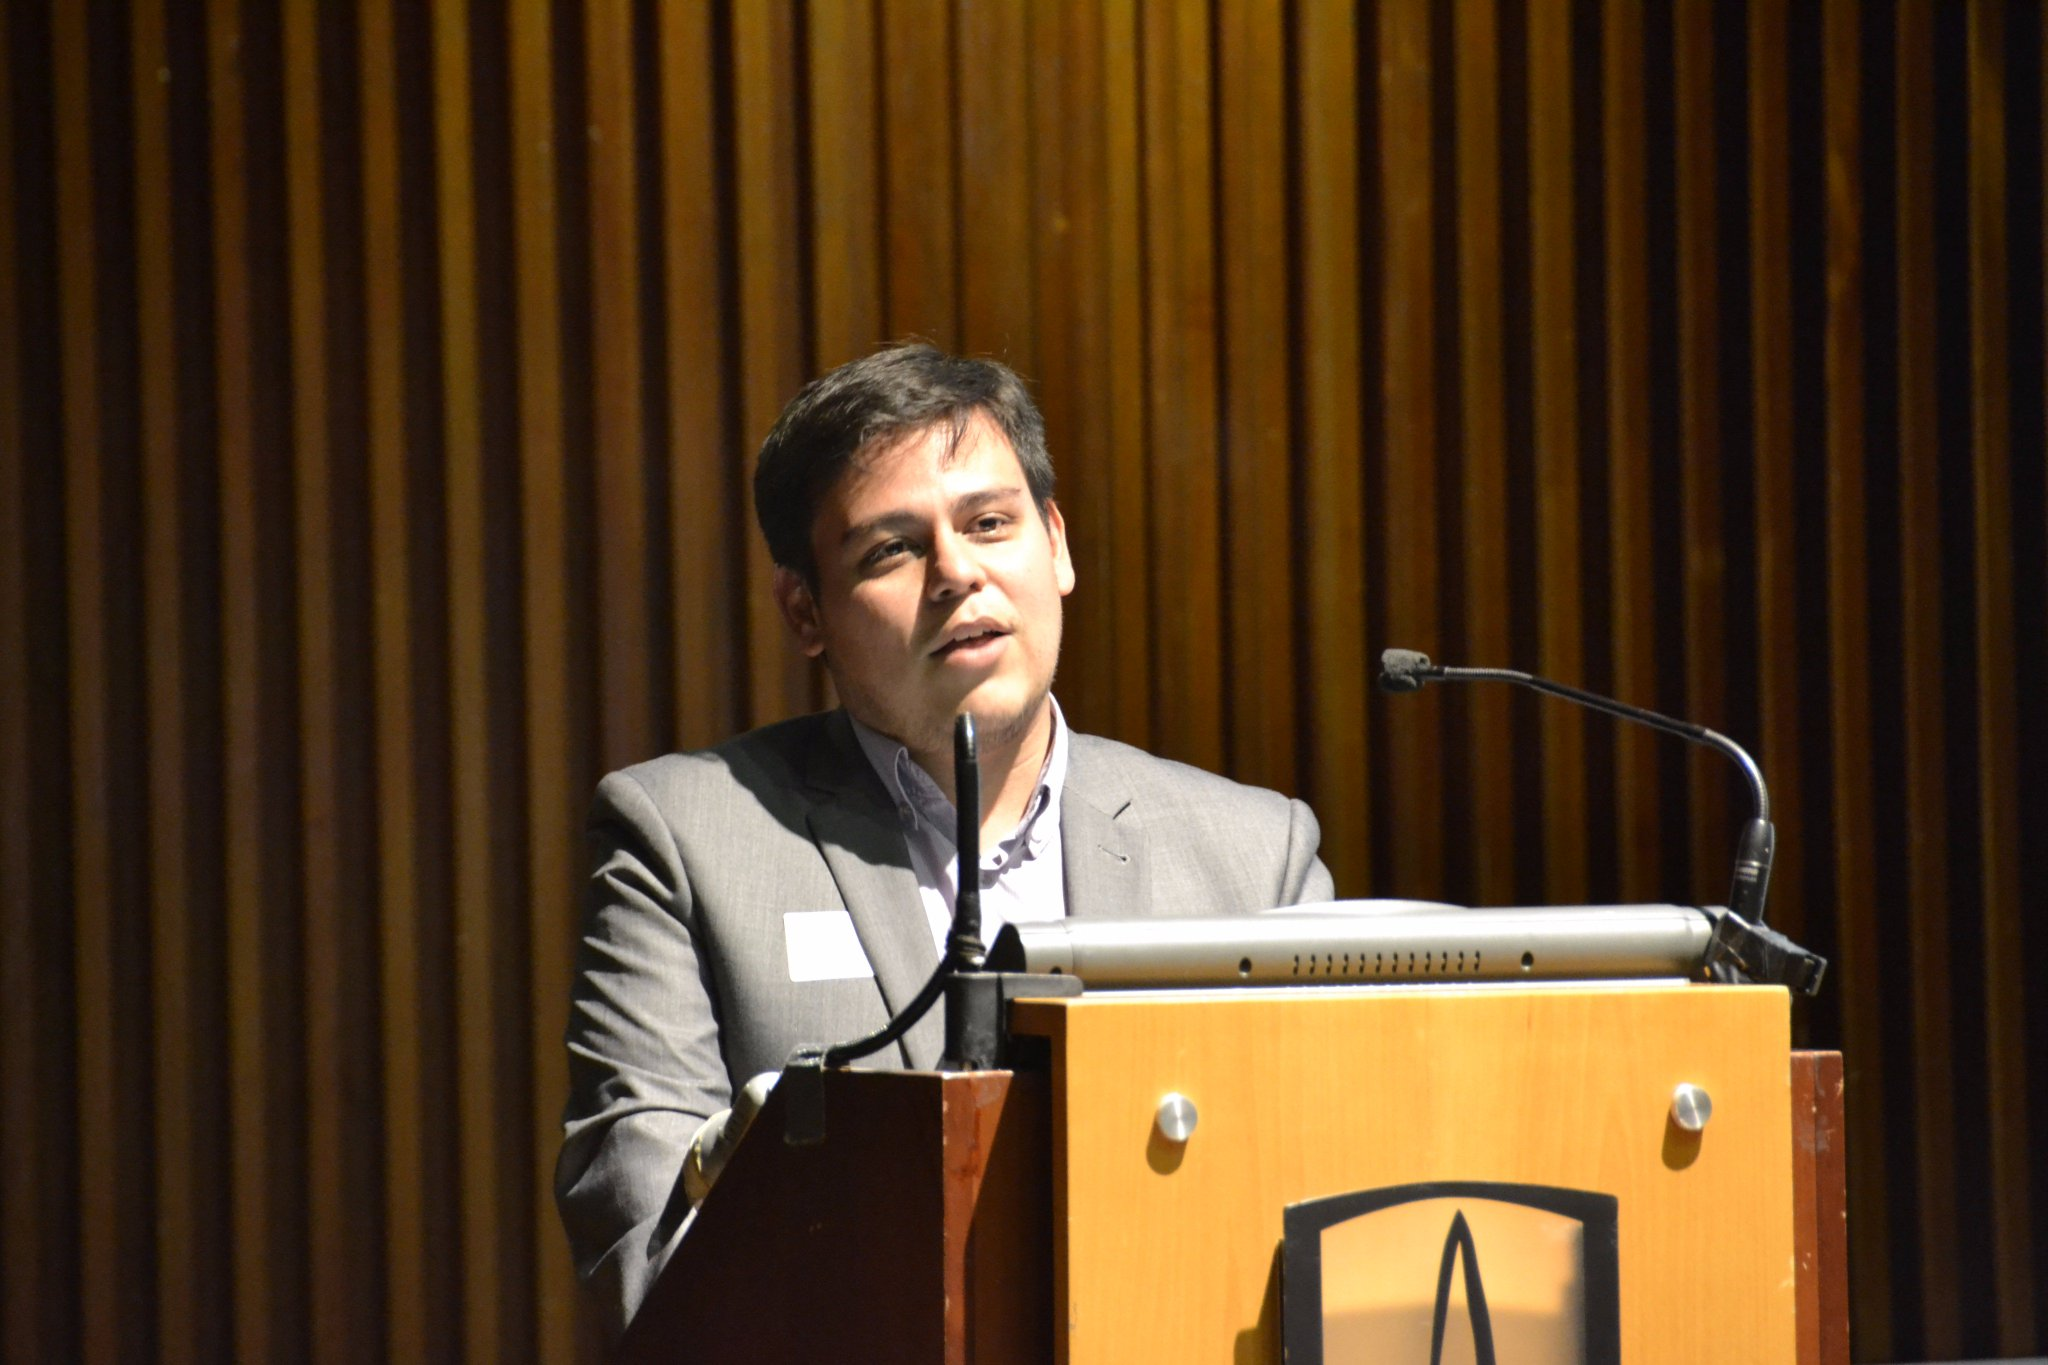 Inicia intervención de César Mantilla (@CesarMant) profesor de @EconUrosario Simposio #CrecimientoVerde #EnVivo: https://t.co/FHxrSkTWeg https://t.co/8cS1dY7Hiw